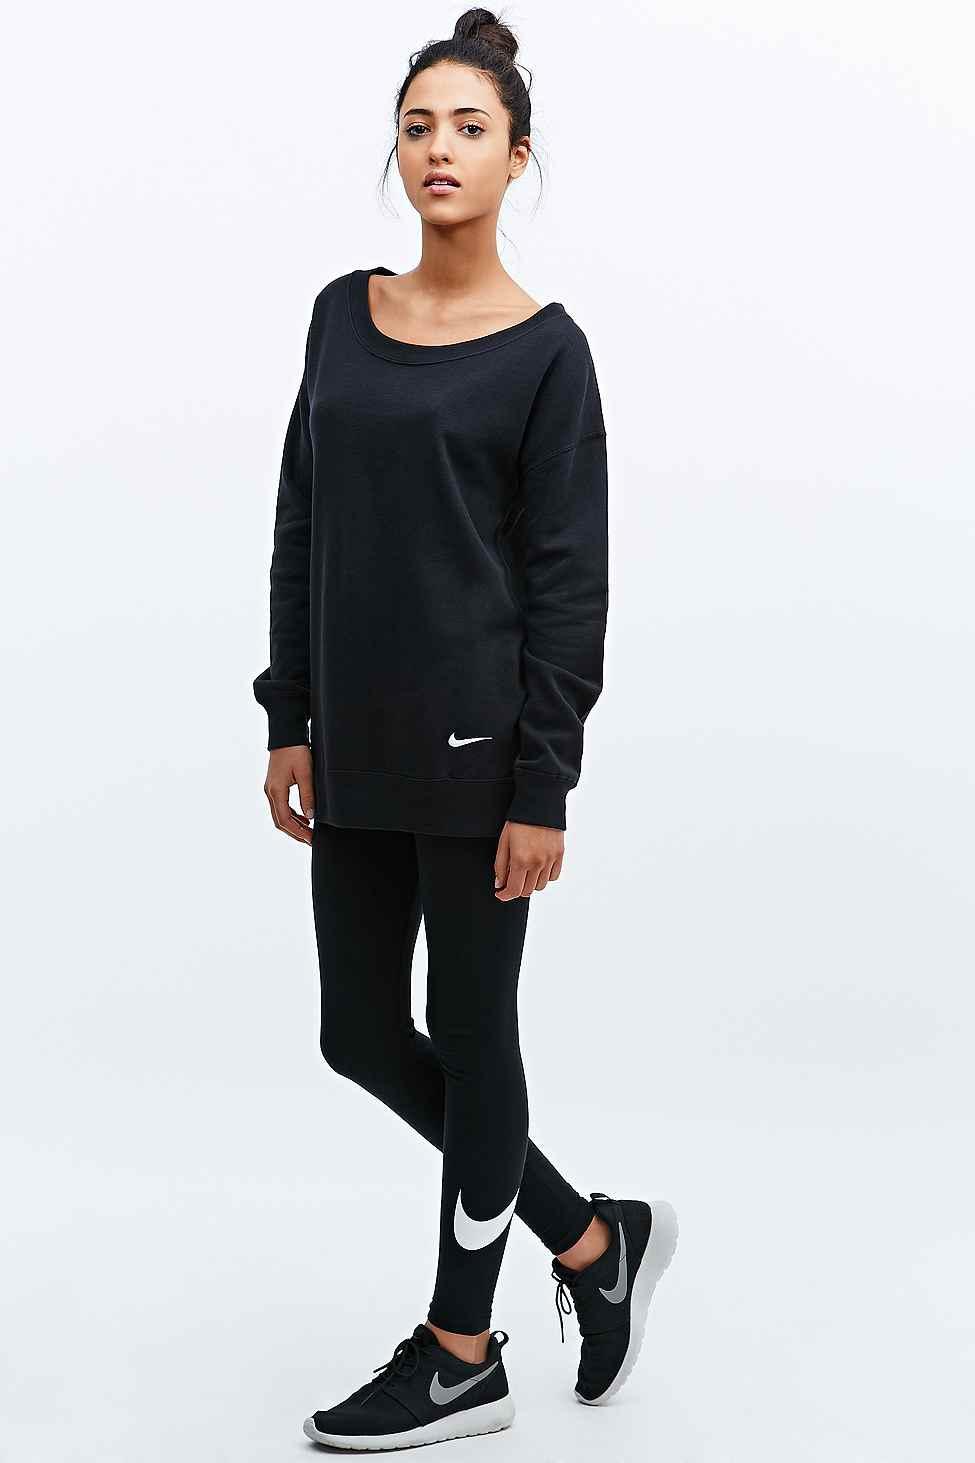 Sport tenue femme - Chapka 5009306ae39